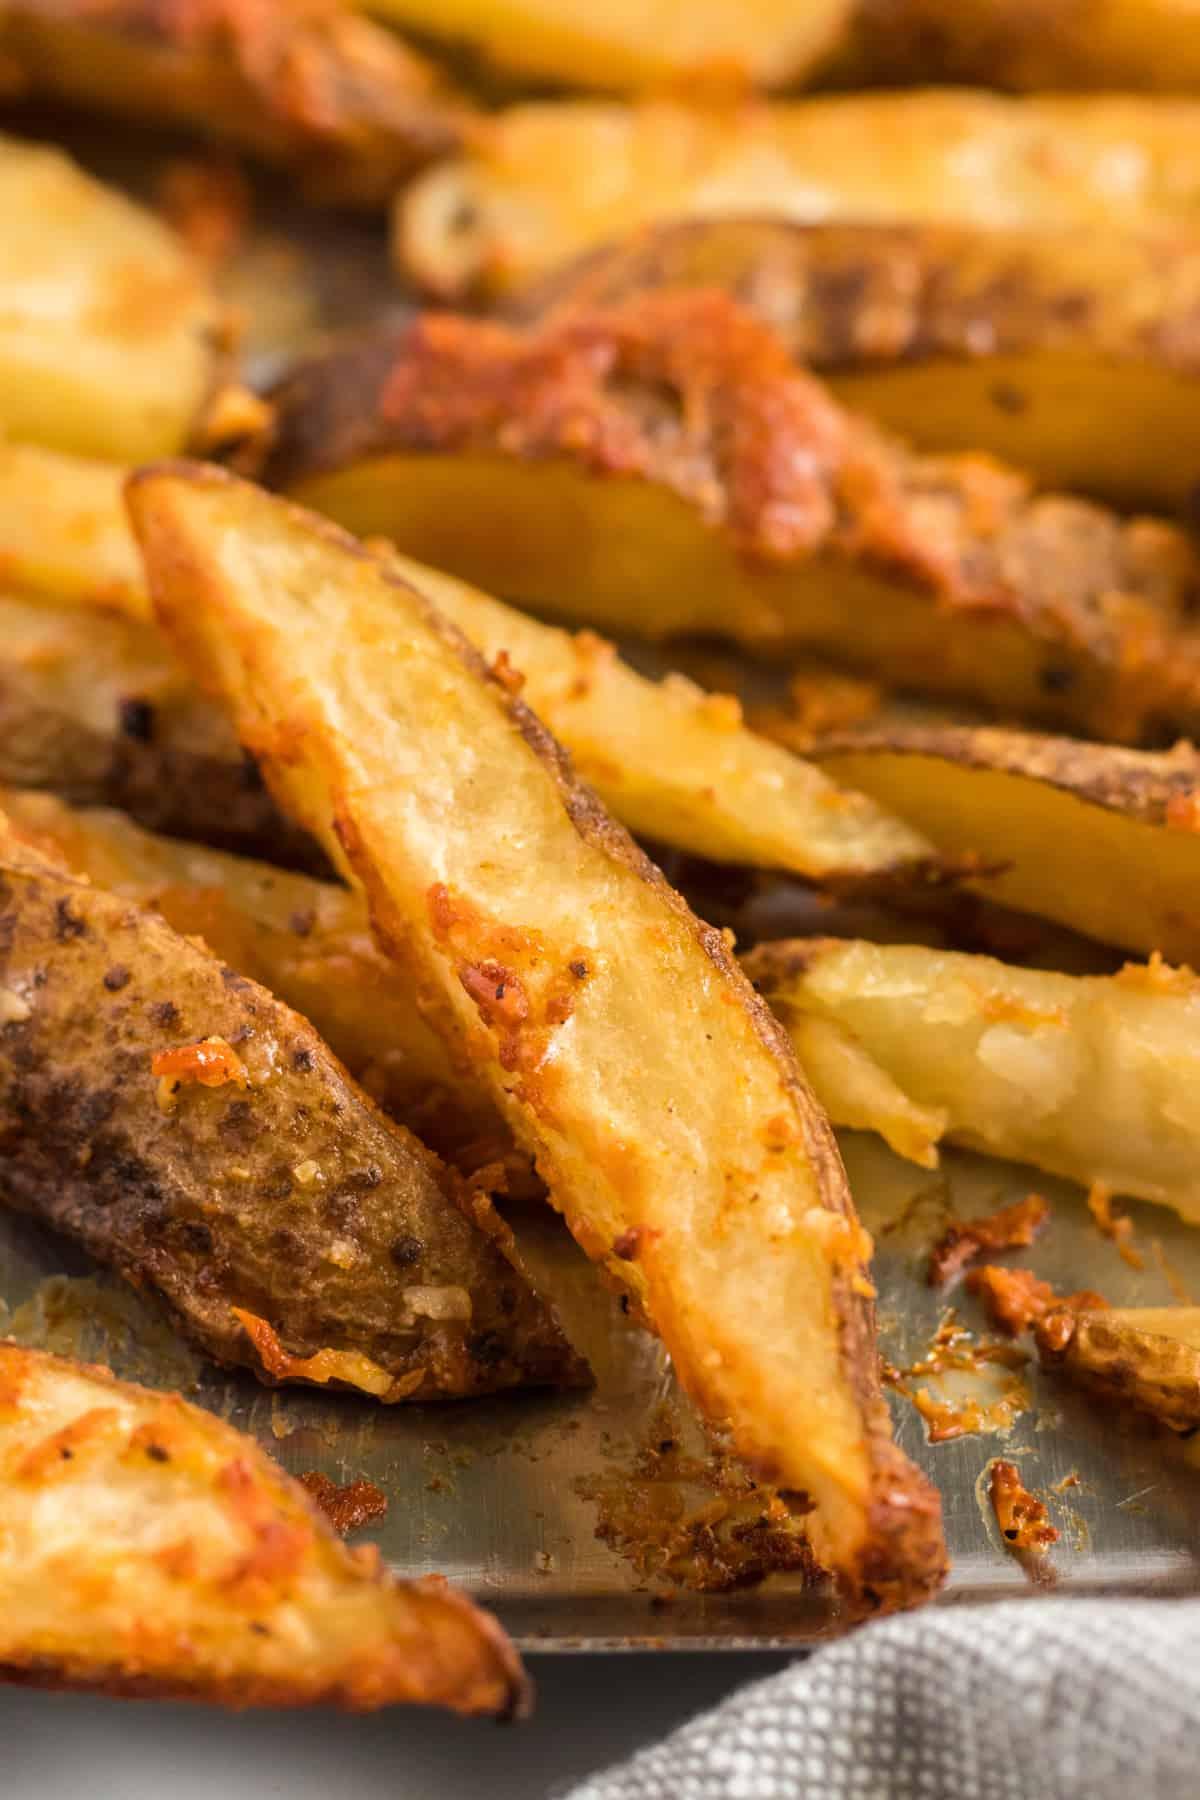 up close image of the crispy potato wedge